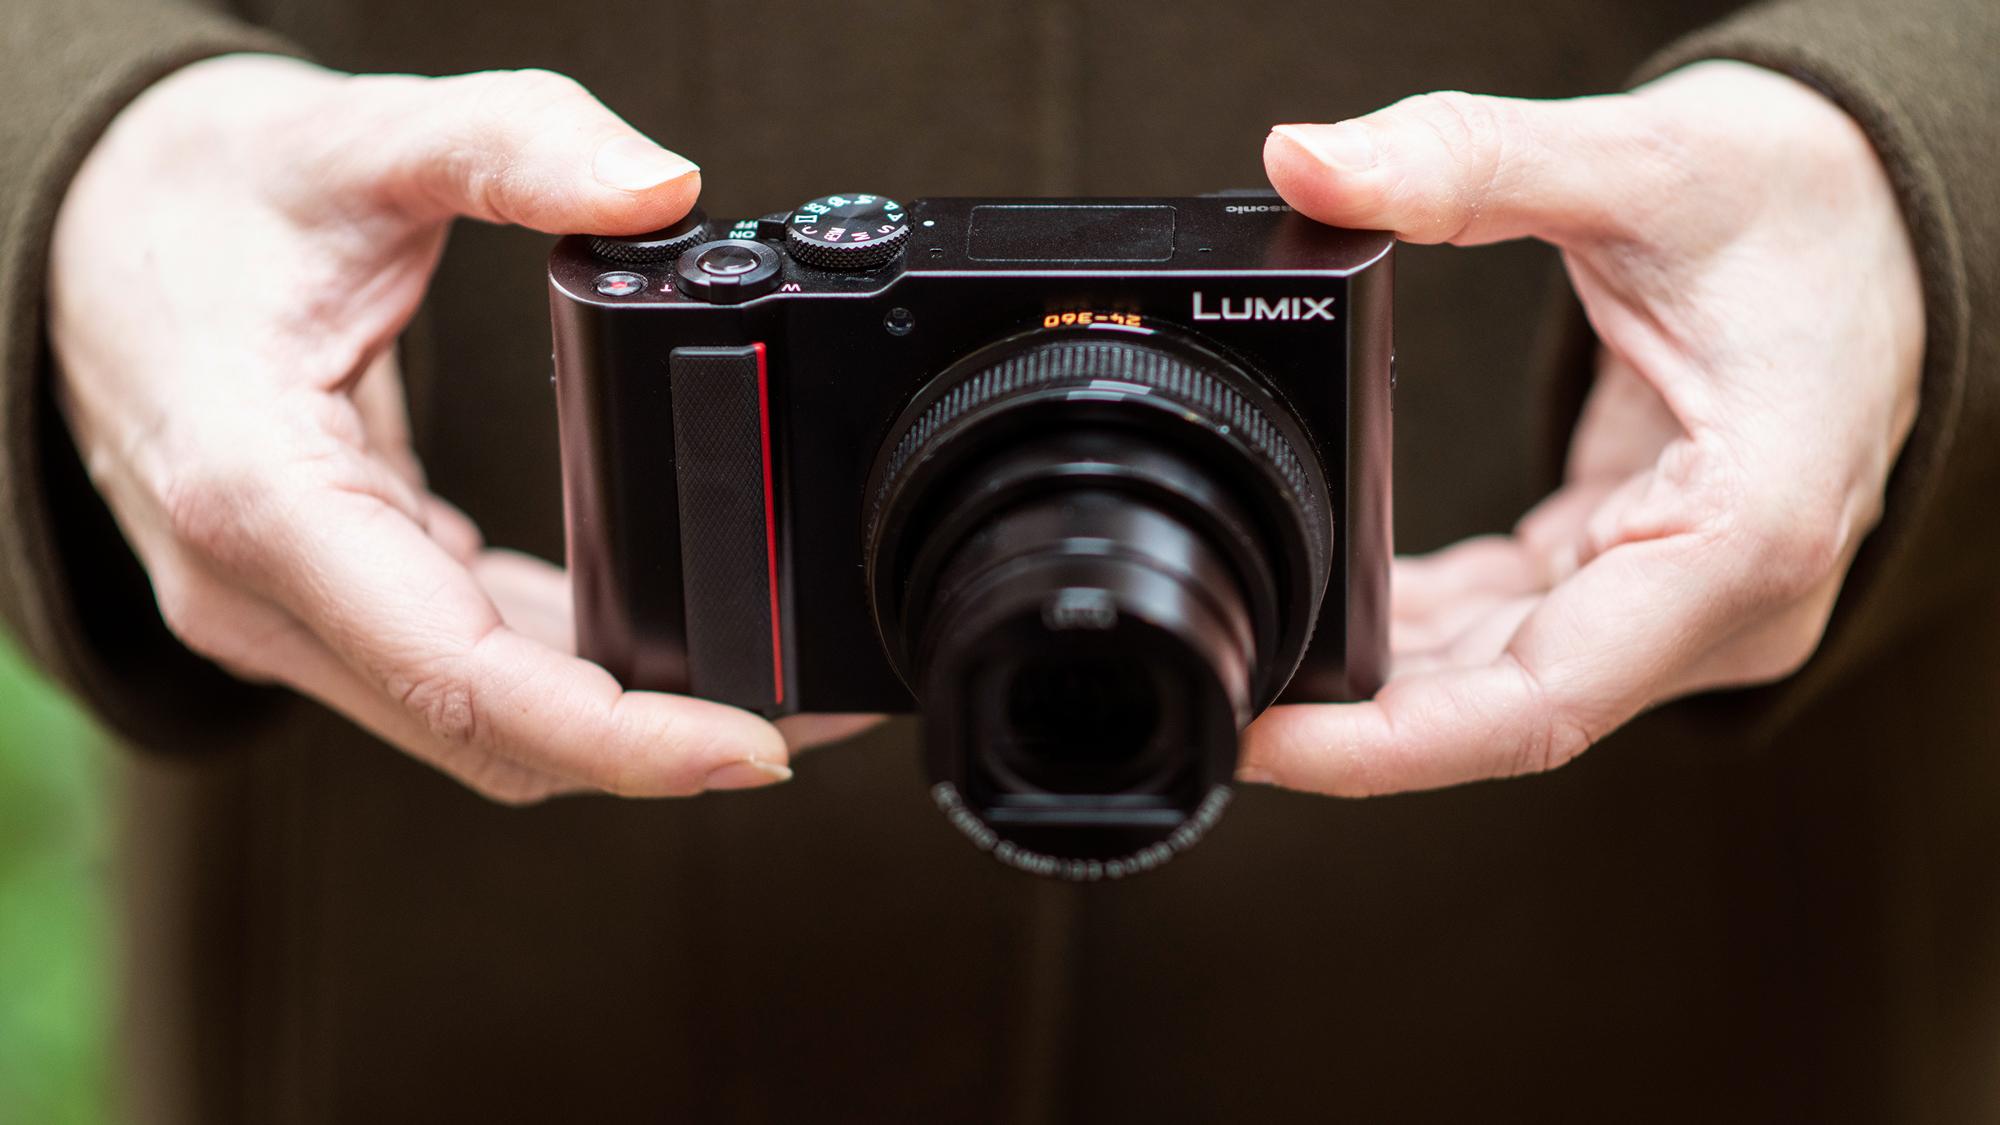 best point-and-shoot cameras: Panasonic Lumix ZS200